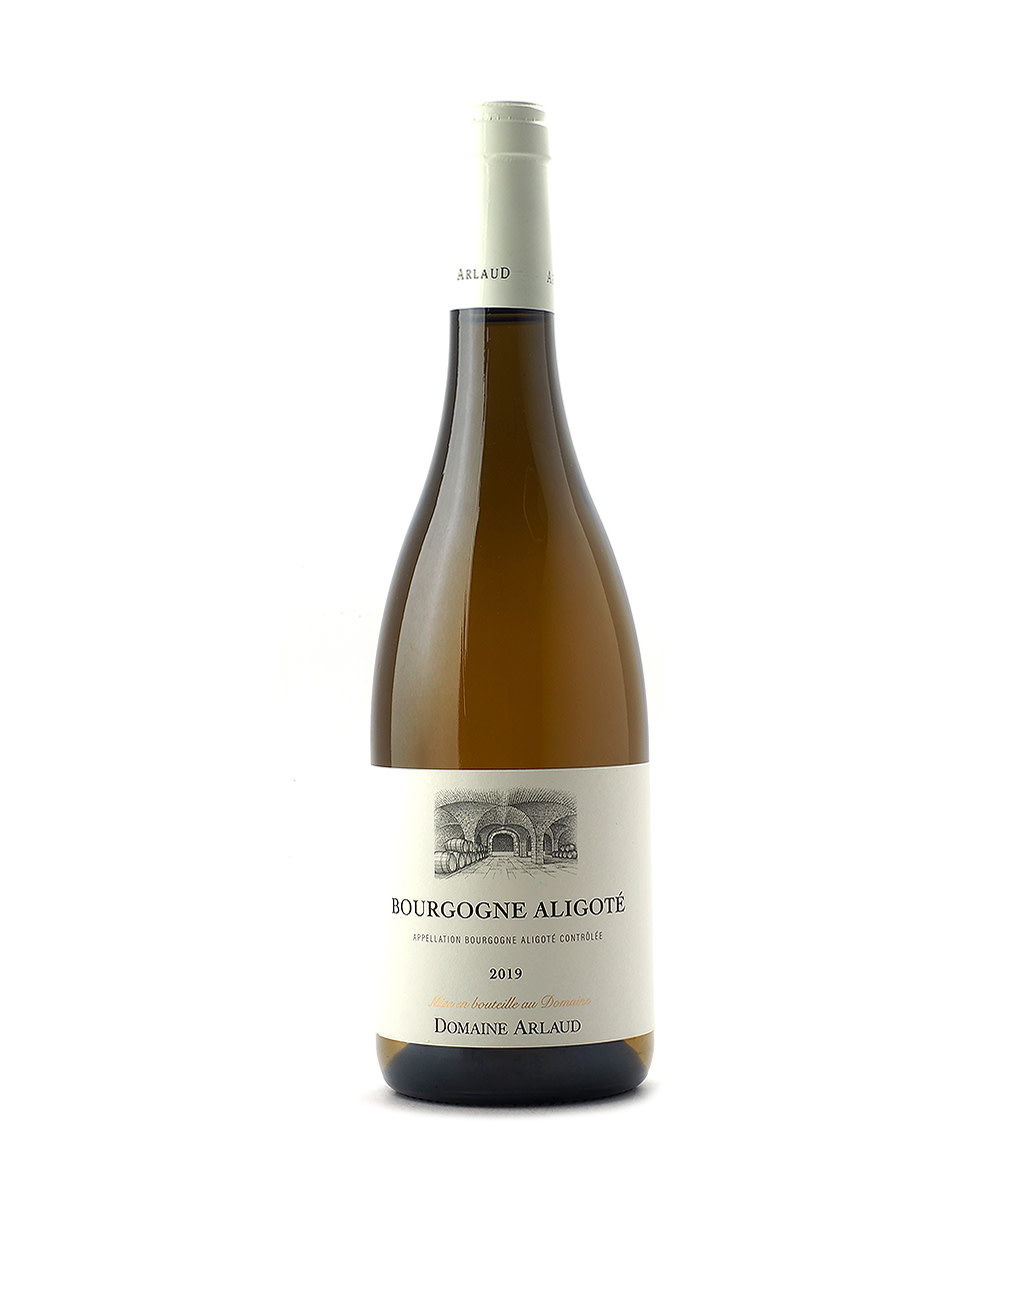 Domaine Arlaud Bourgogne Aligote 2019